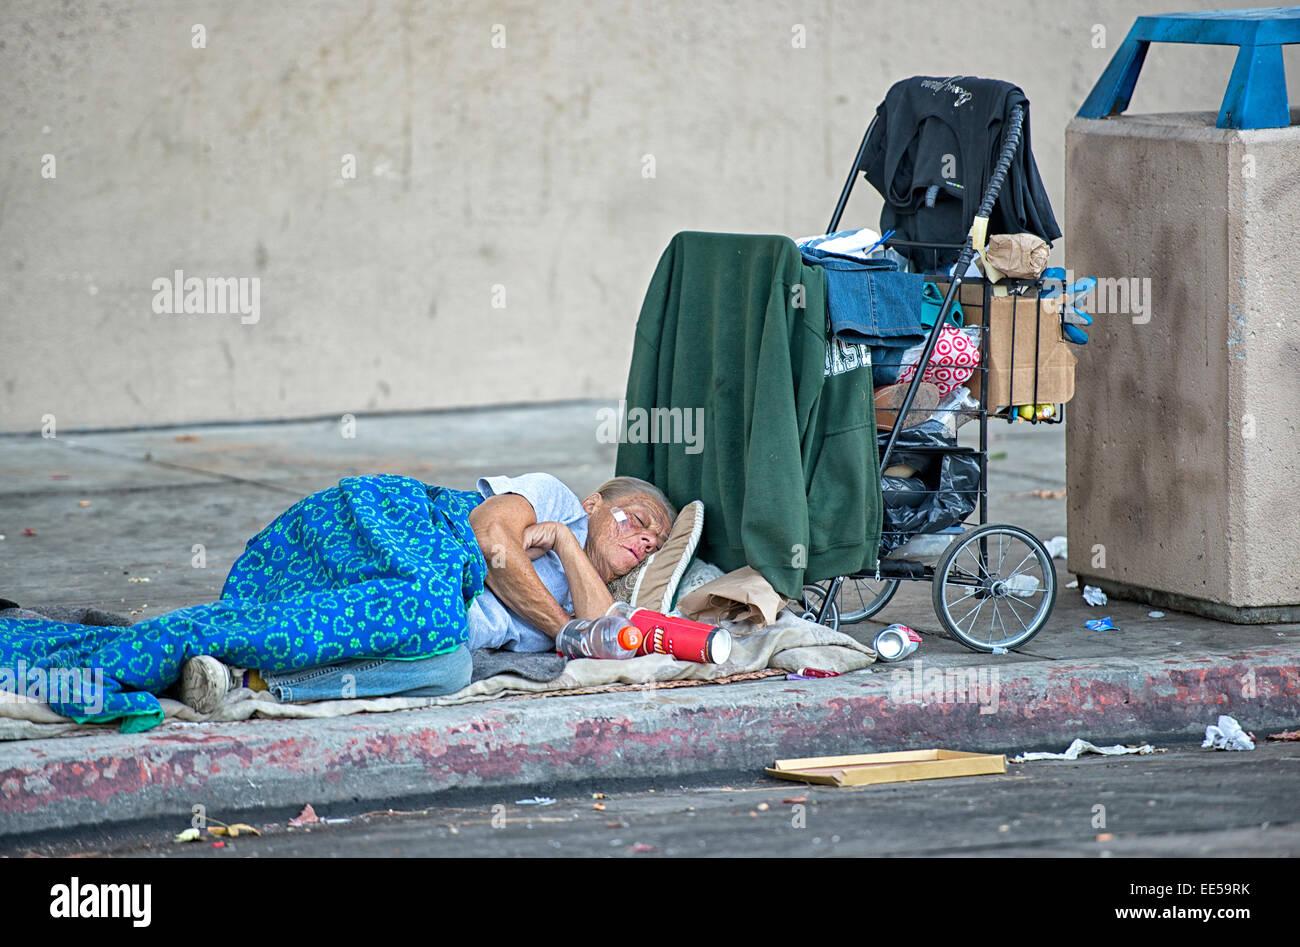 Homeless Elderly Woman Sleeping On Sidewalk Next To